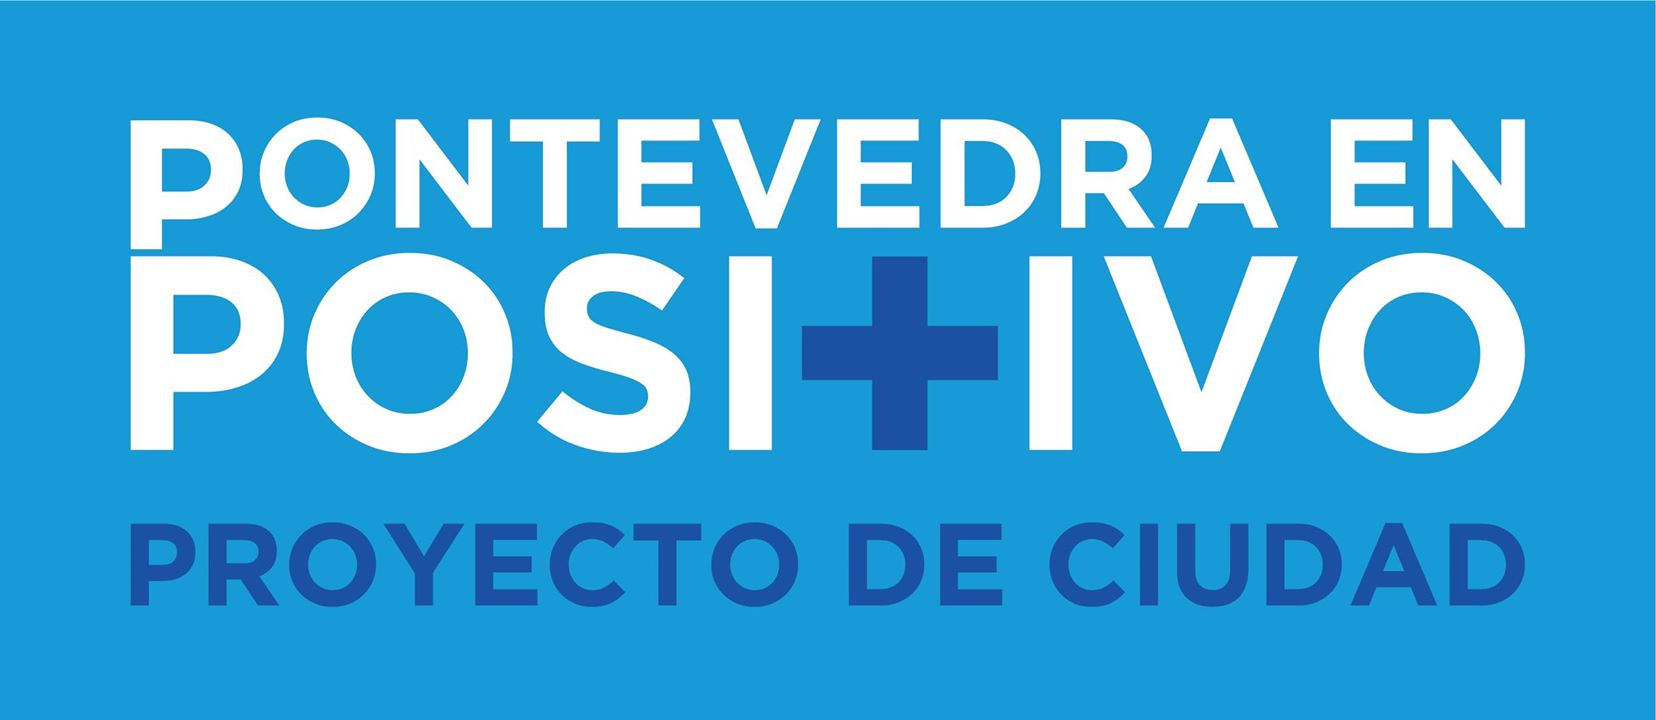 Pontevedra +